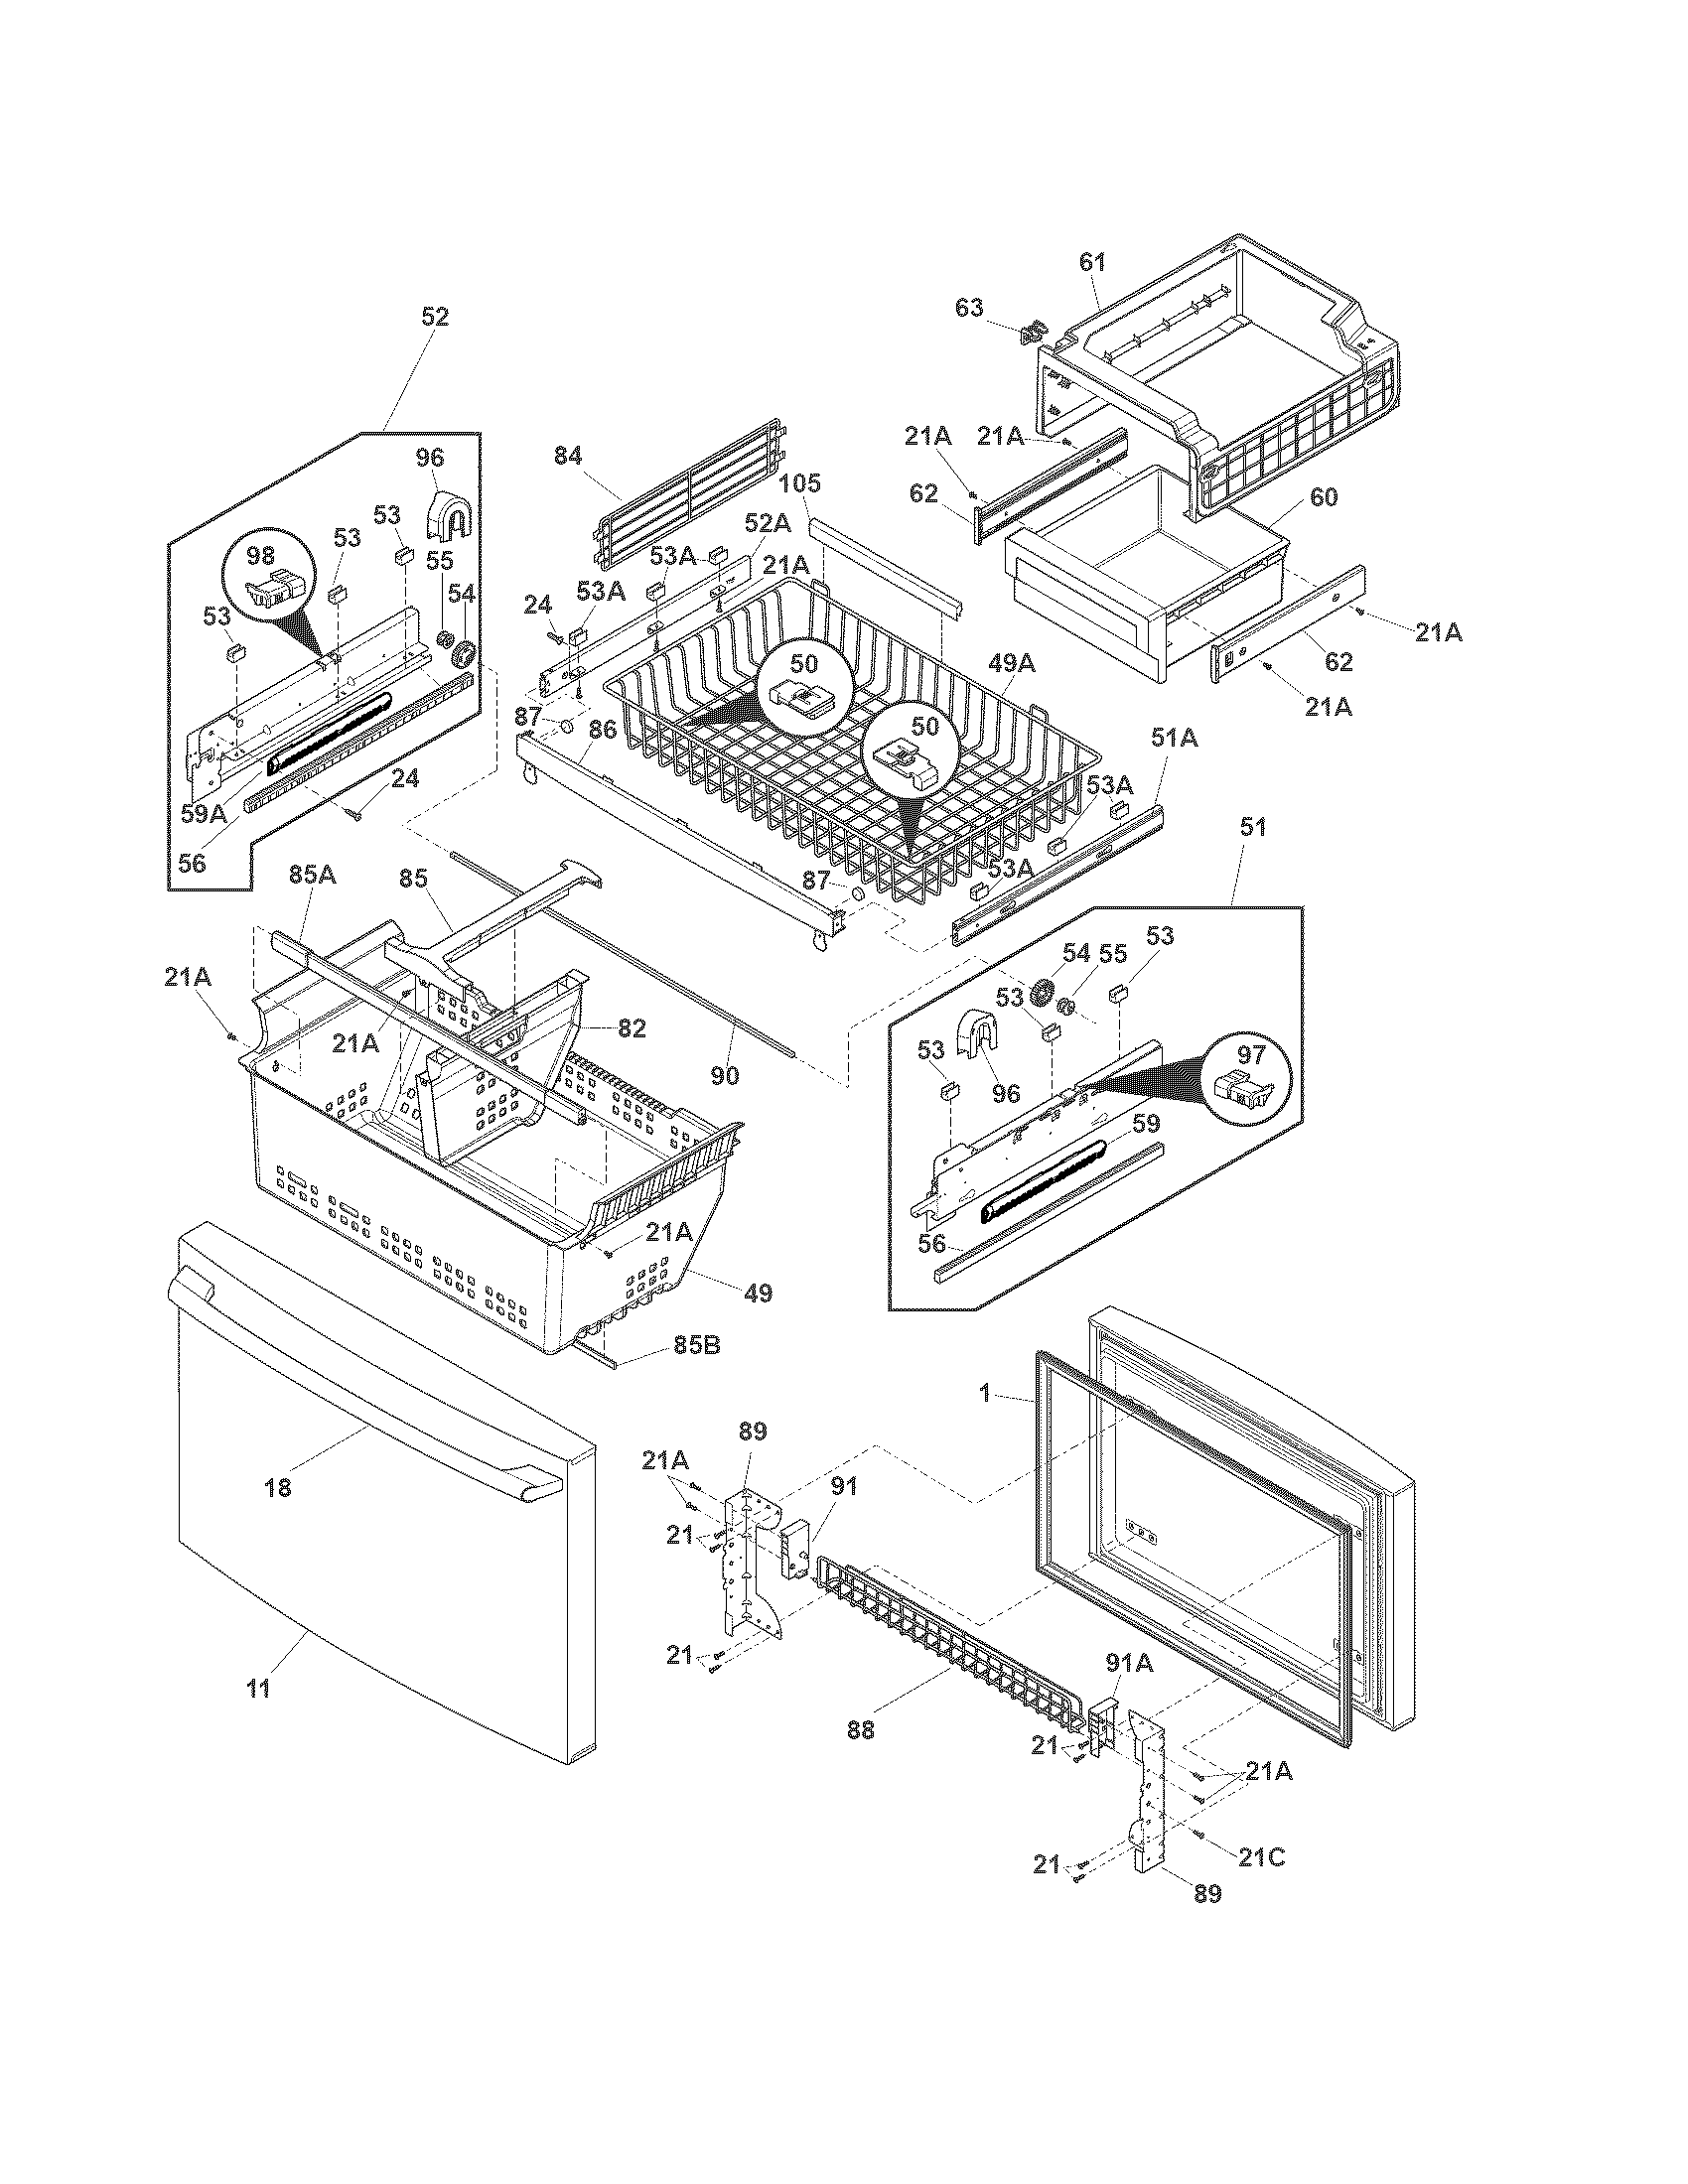 freezer system wiring diagram